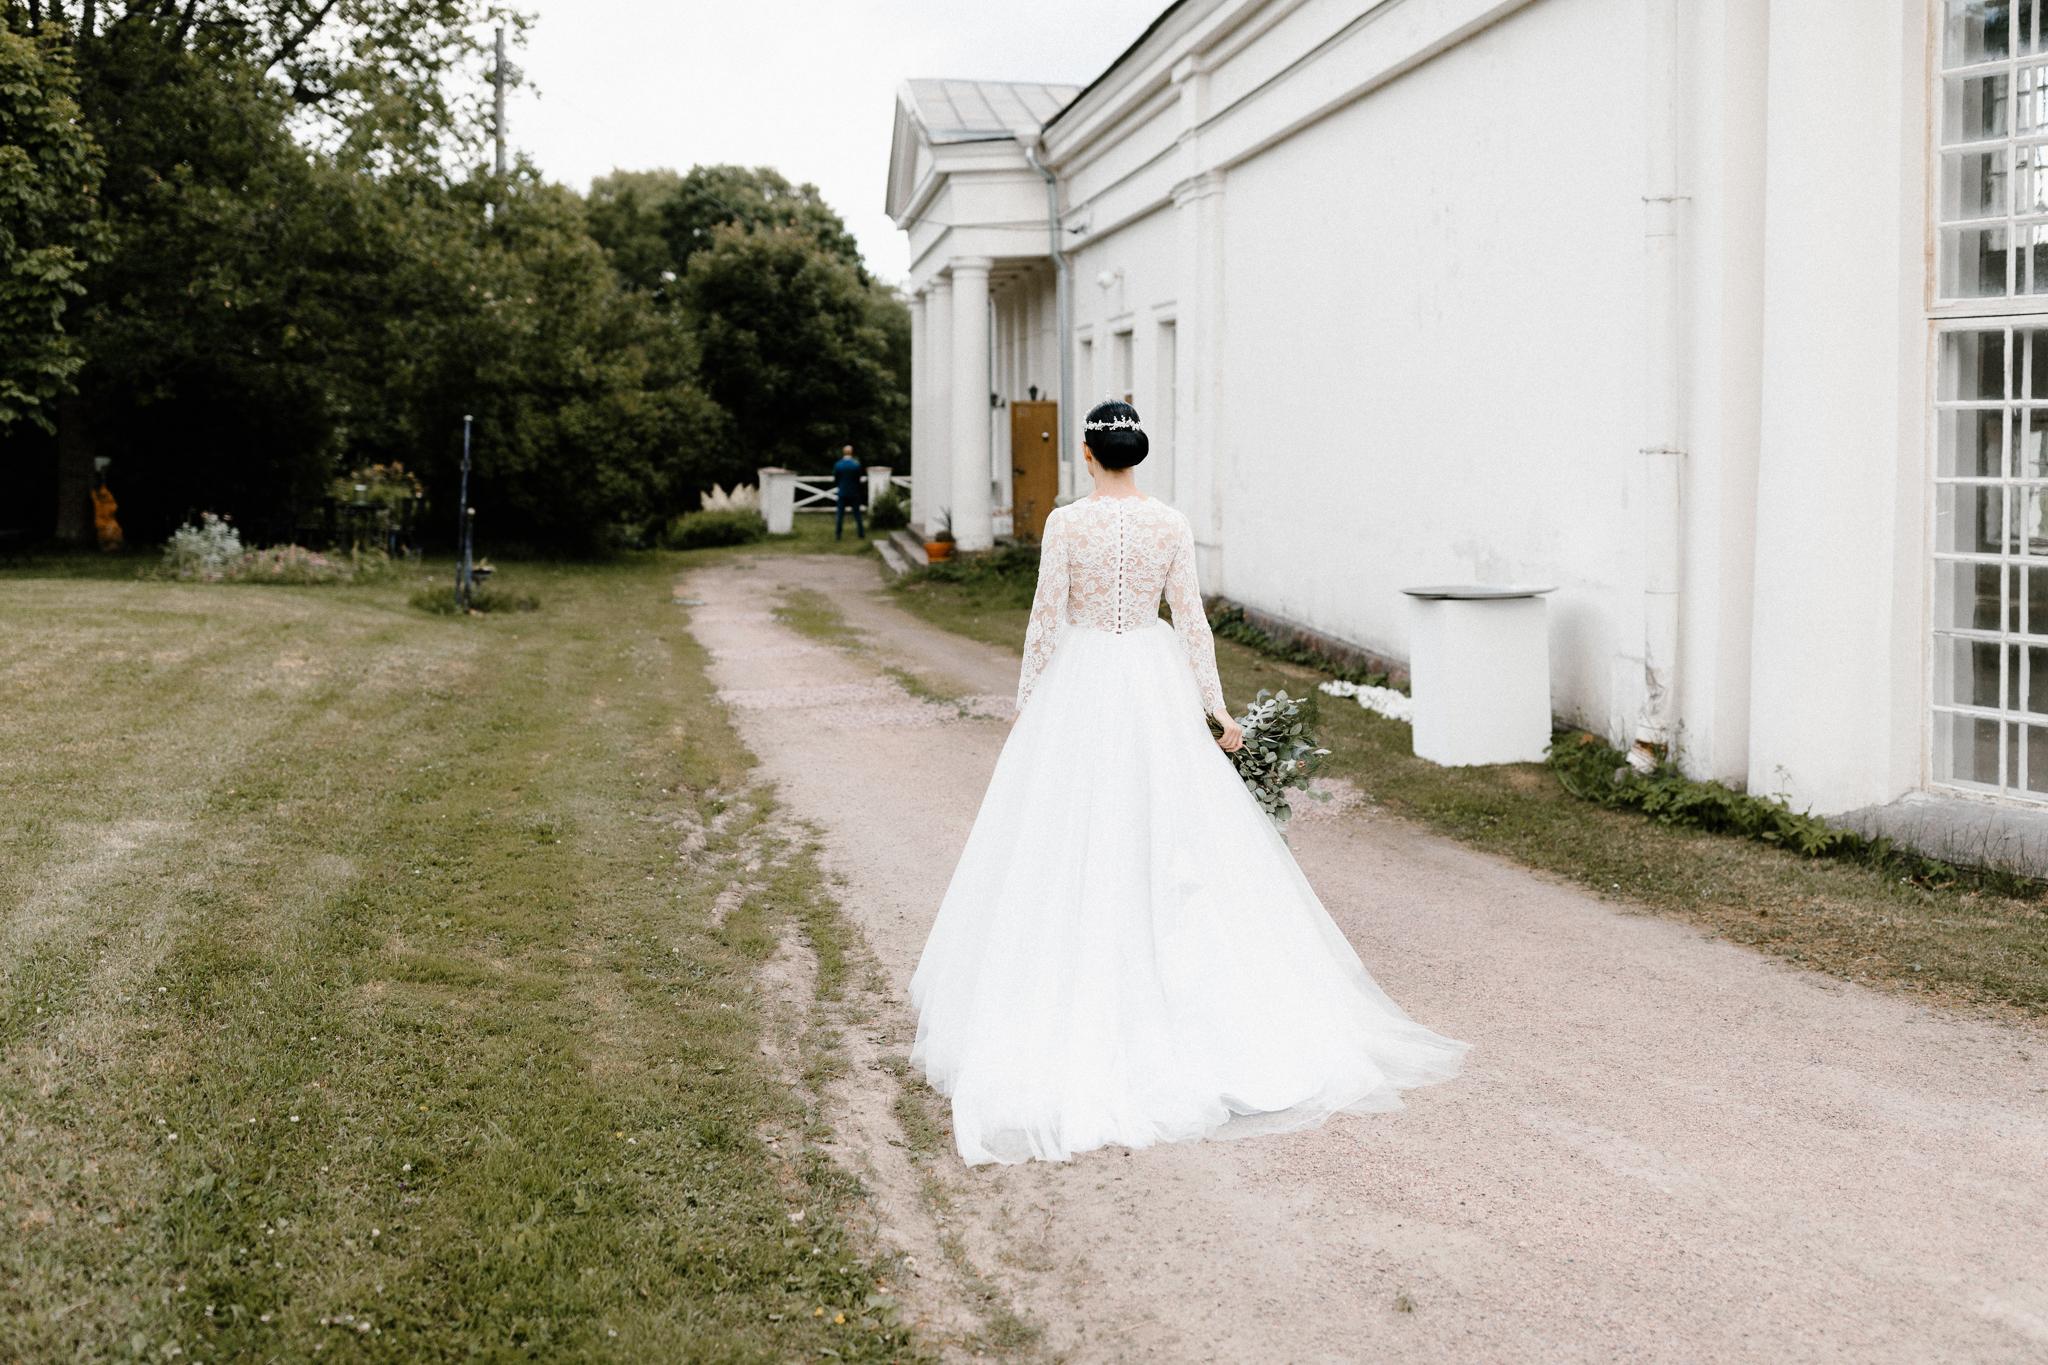 Essi + Ville | Oitbacka Gården | by Patrick Karkkolainen Wedding Photography-37.jpg